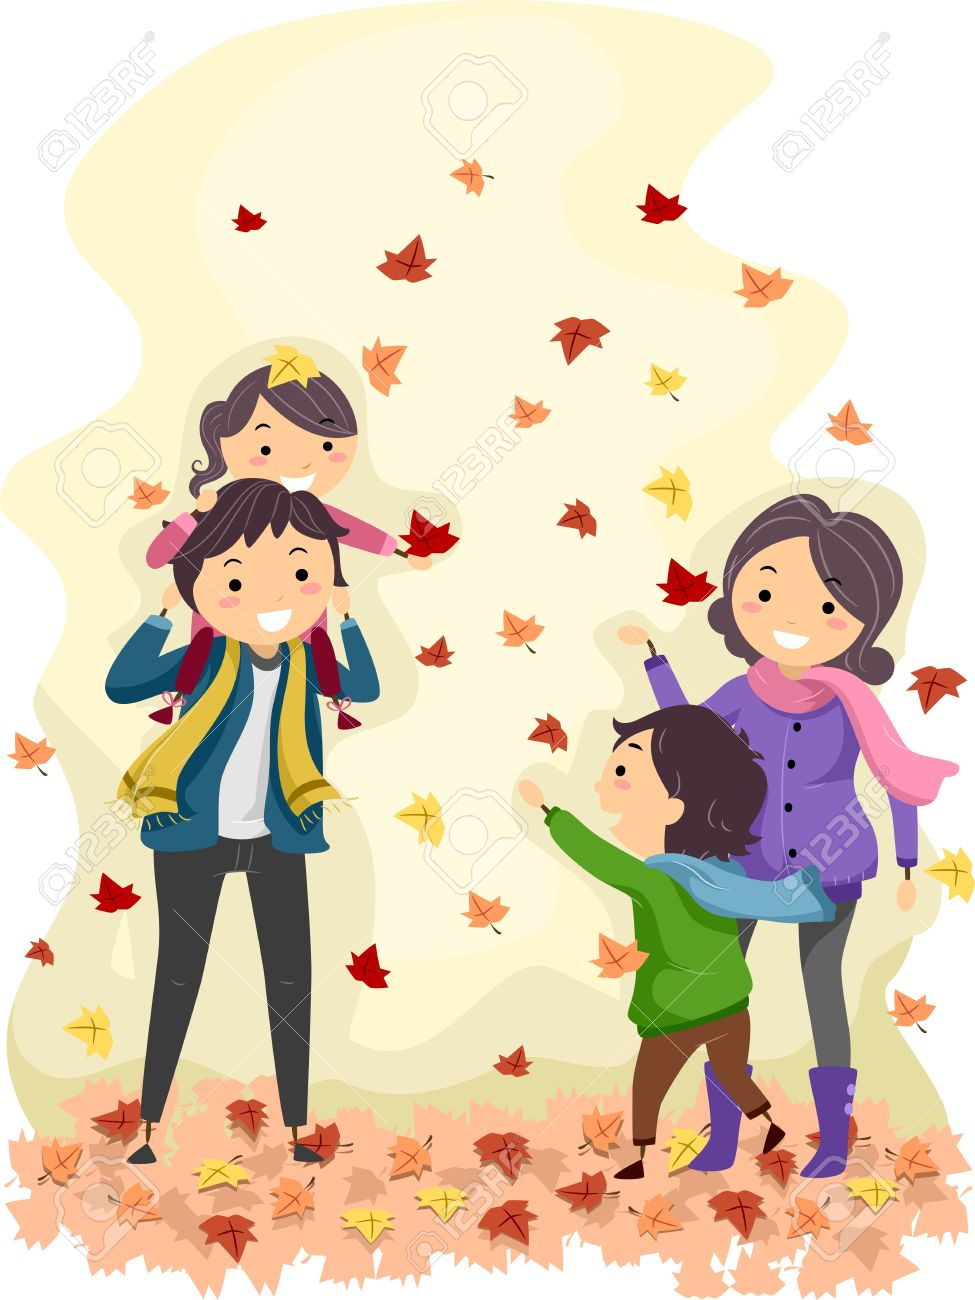 Illustration Of A Family Enjoying An Autumn Day Stock Photo.